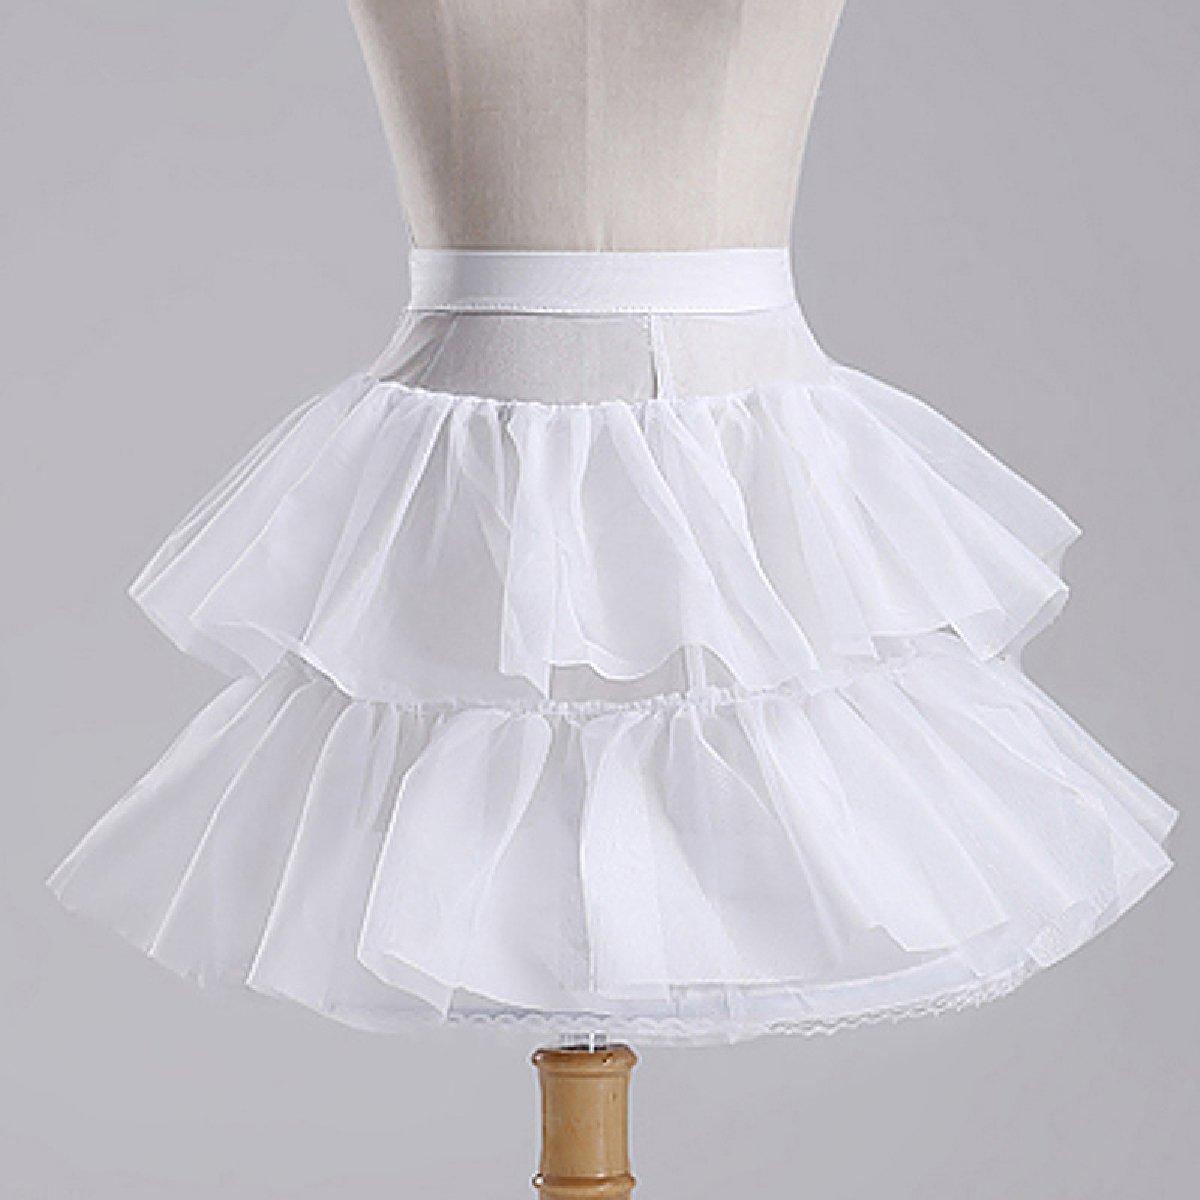 Girls A line Weeding Flower Girl Underskirt Crinoline Petticoat MPC031